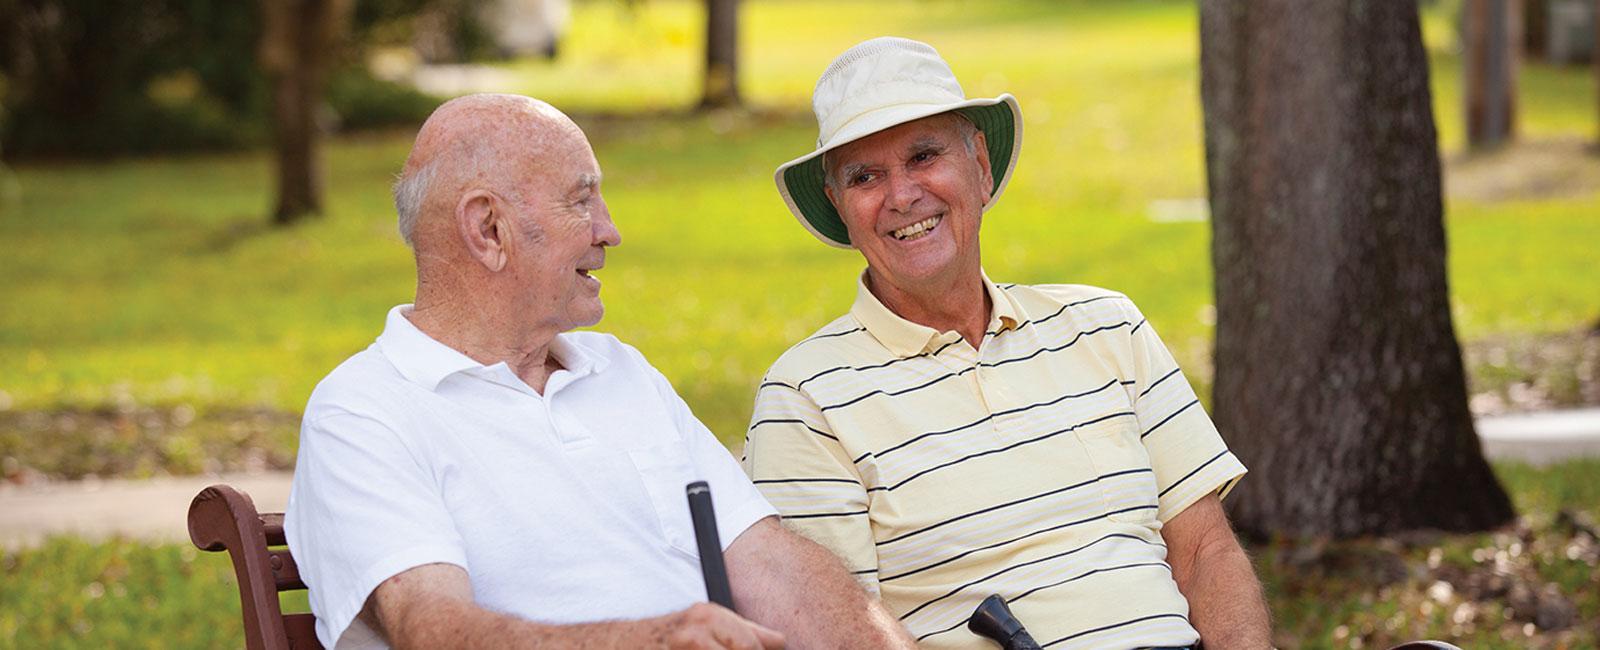 East Ridge Residents Fondly Recount Memories of Fatherhood